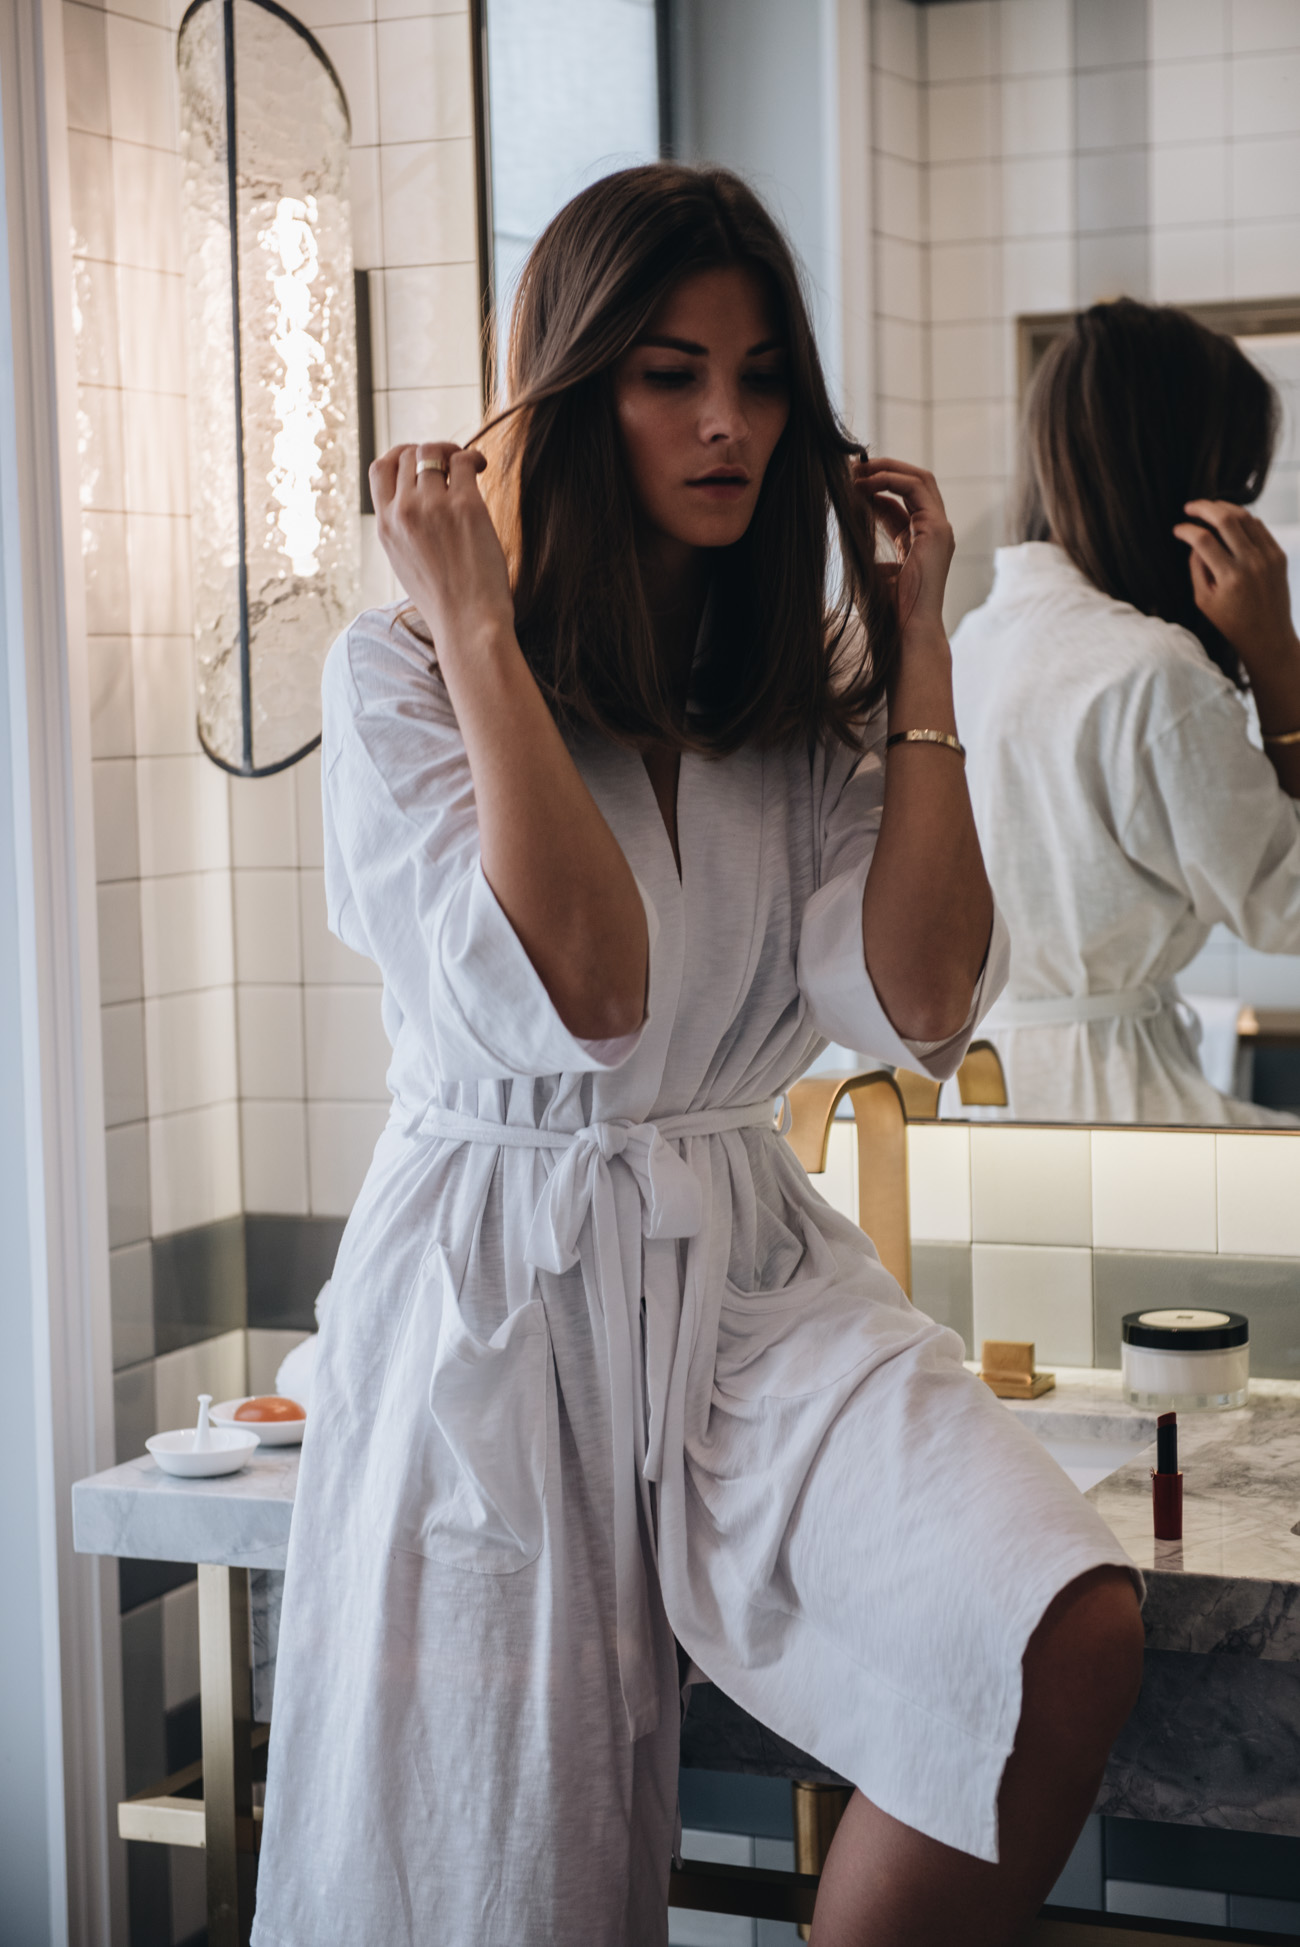 Nolinski-Hotel-paris-Beauty-Editorial-giorgio-armani-ecstasy-shine-lippenstifte-nina-schwichtenberg-fashiioncarpet